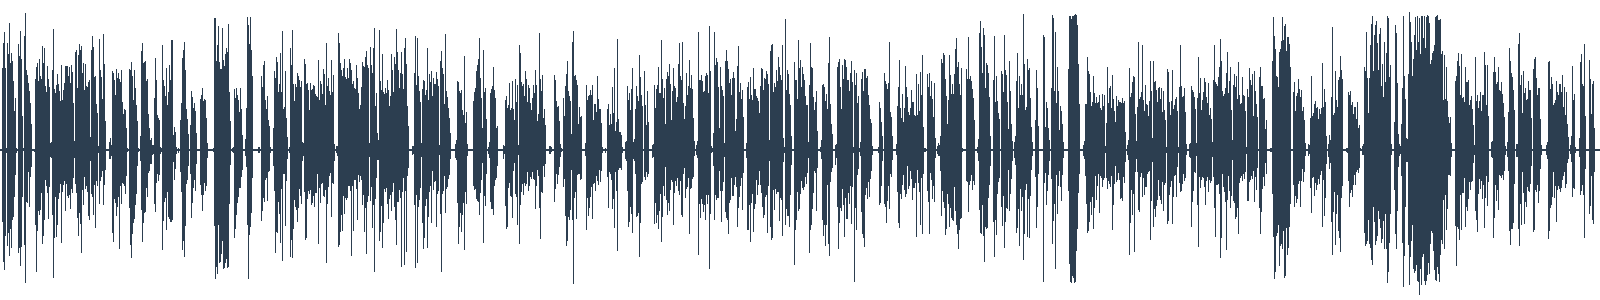 Vrania šestka (Vrania šestka 1) waveform